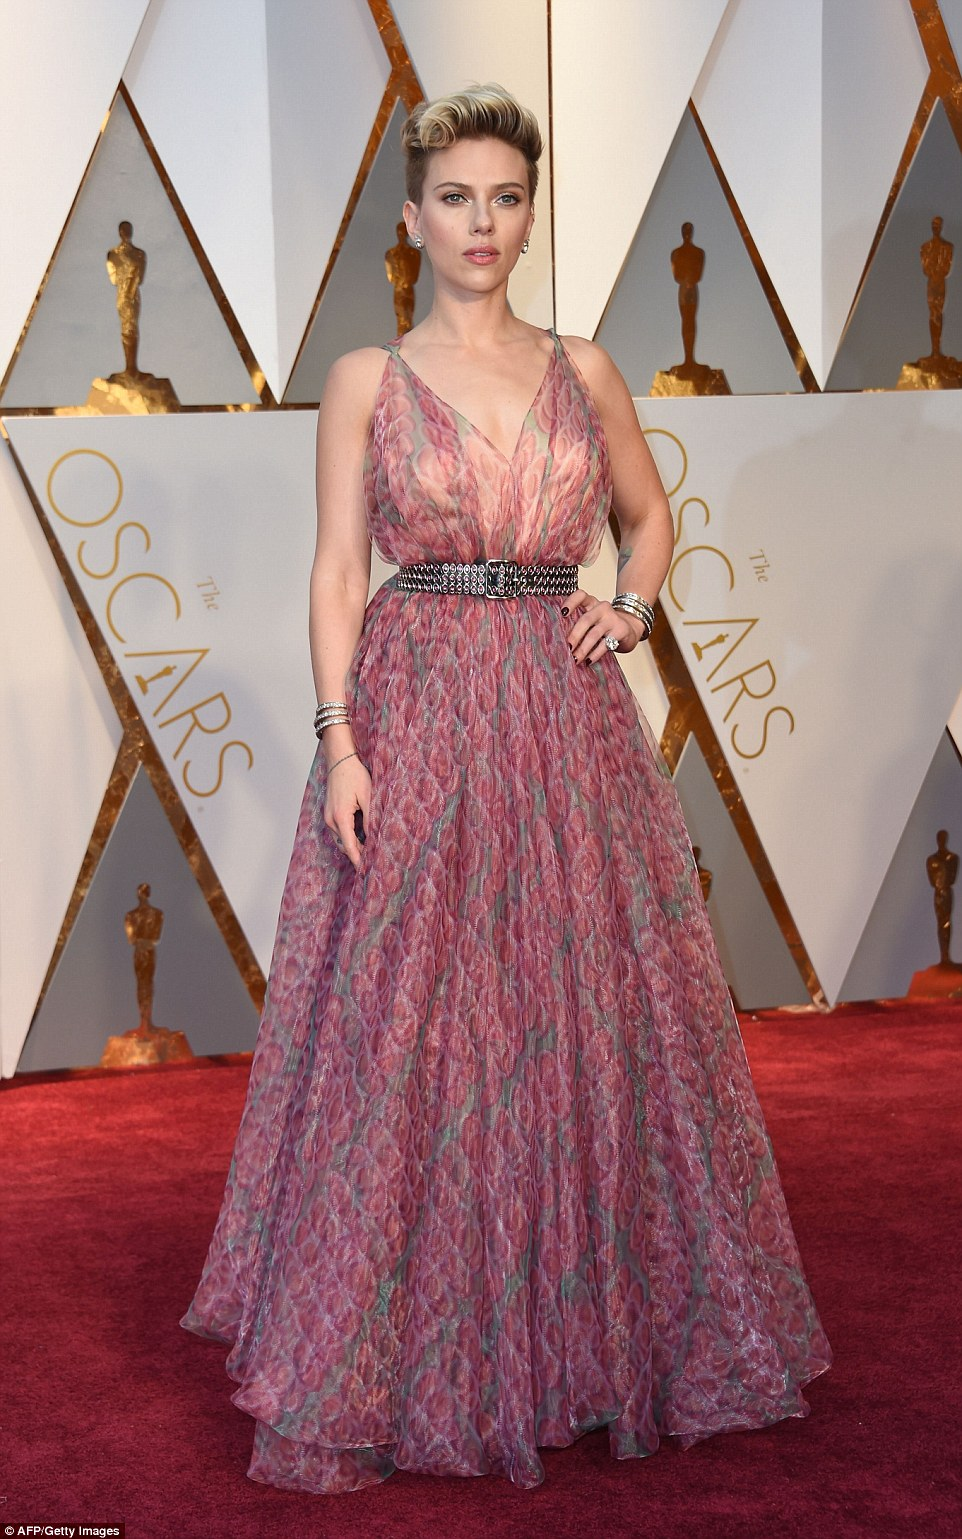 Scarlett Johansson in Azzedine Alia